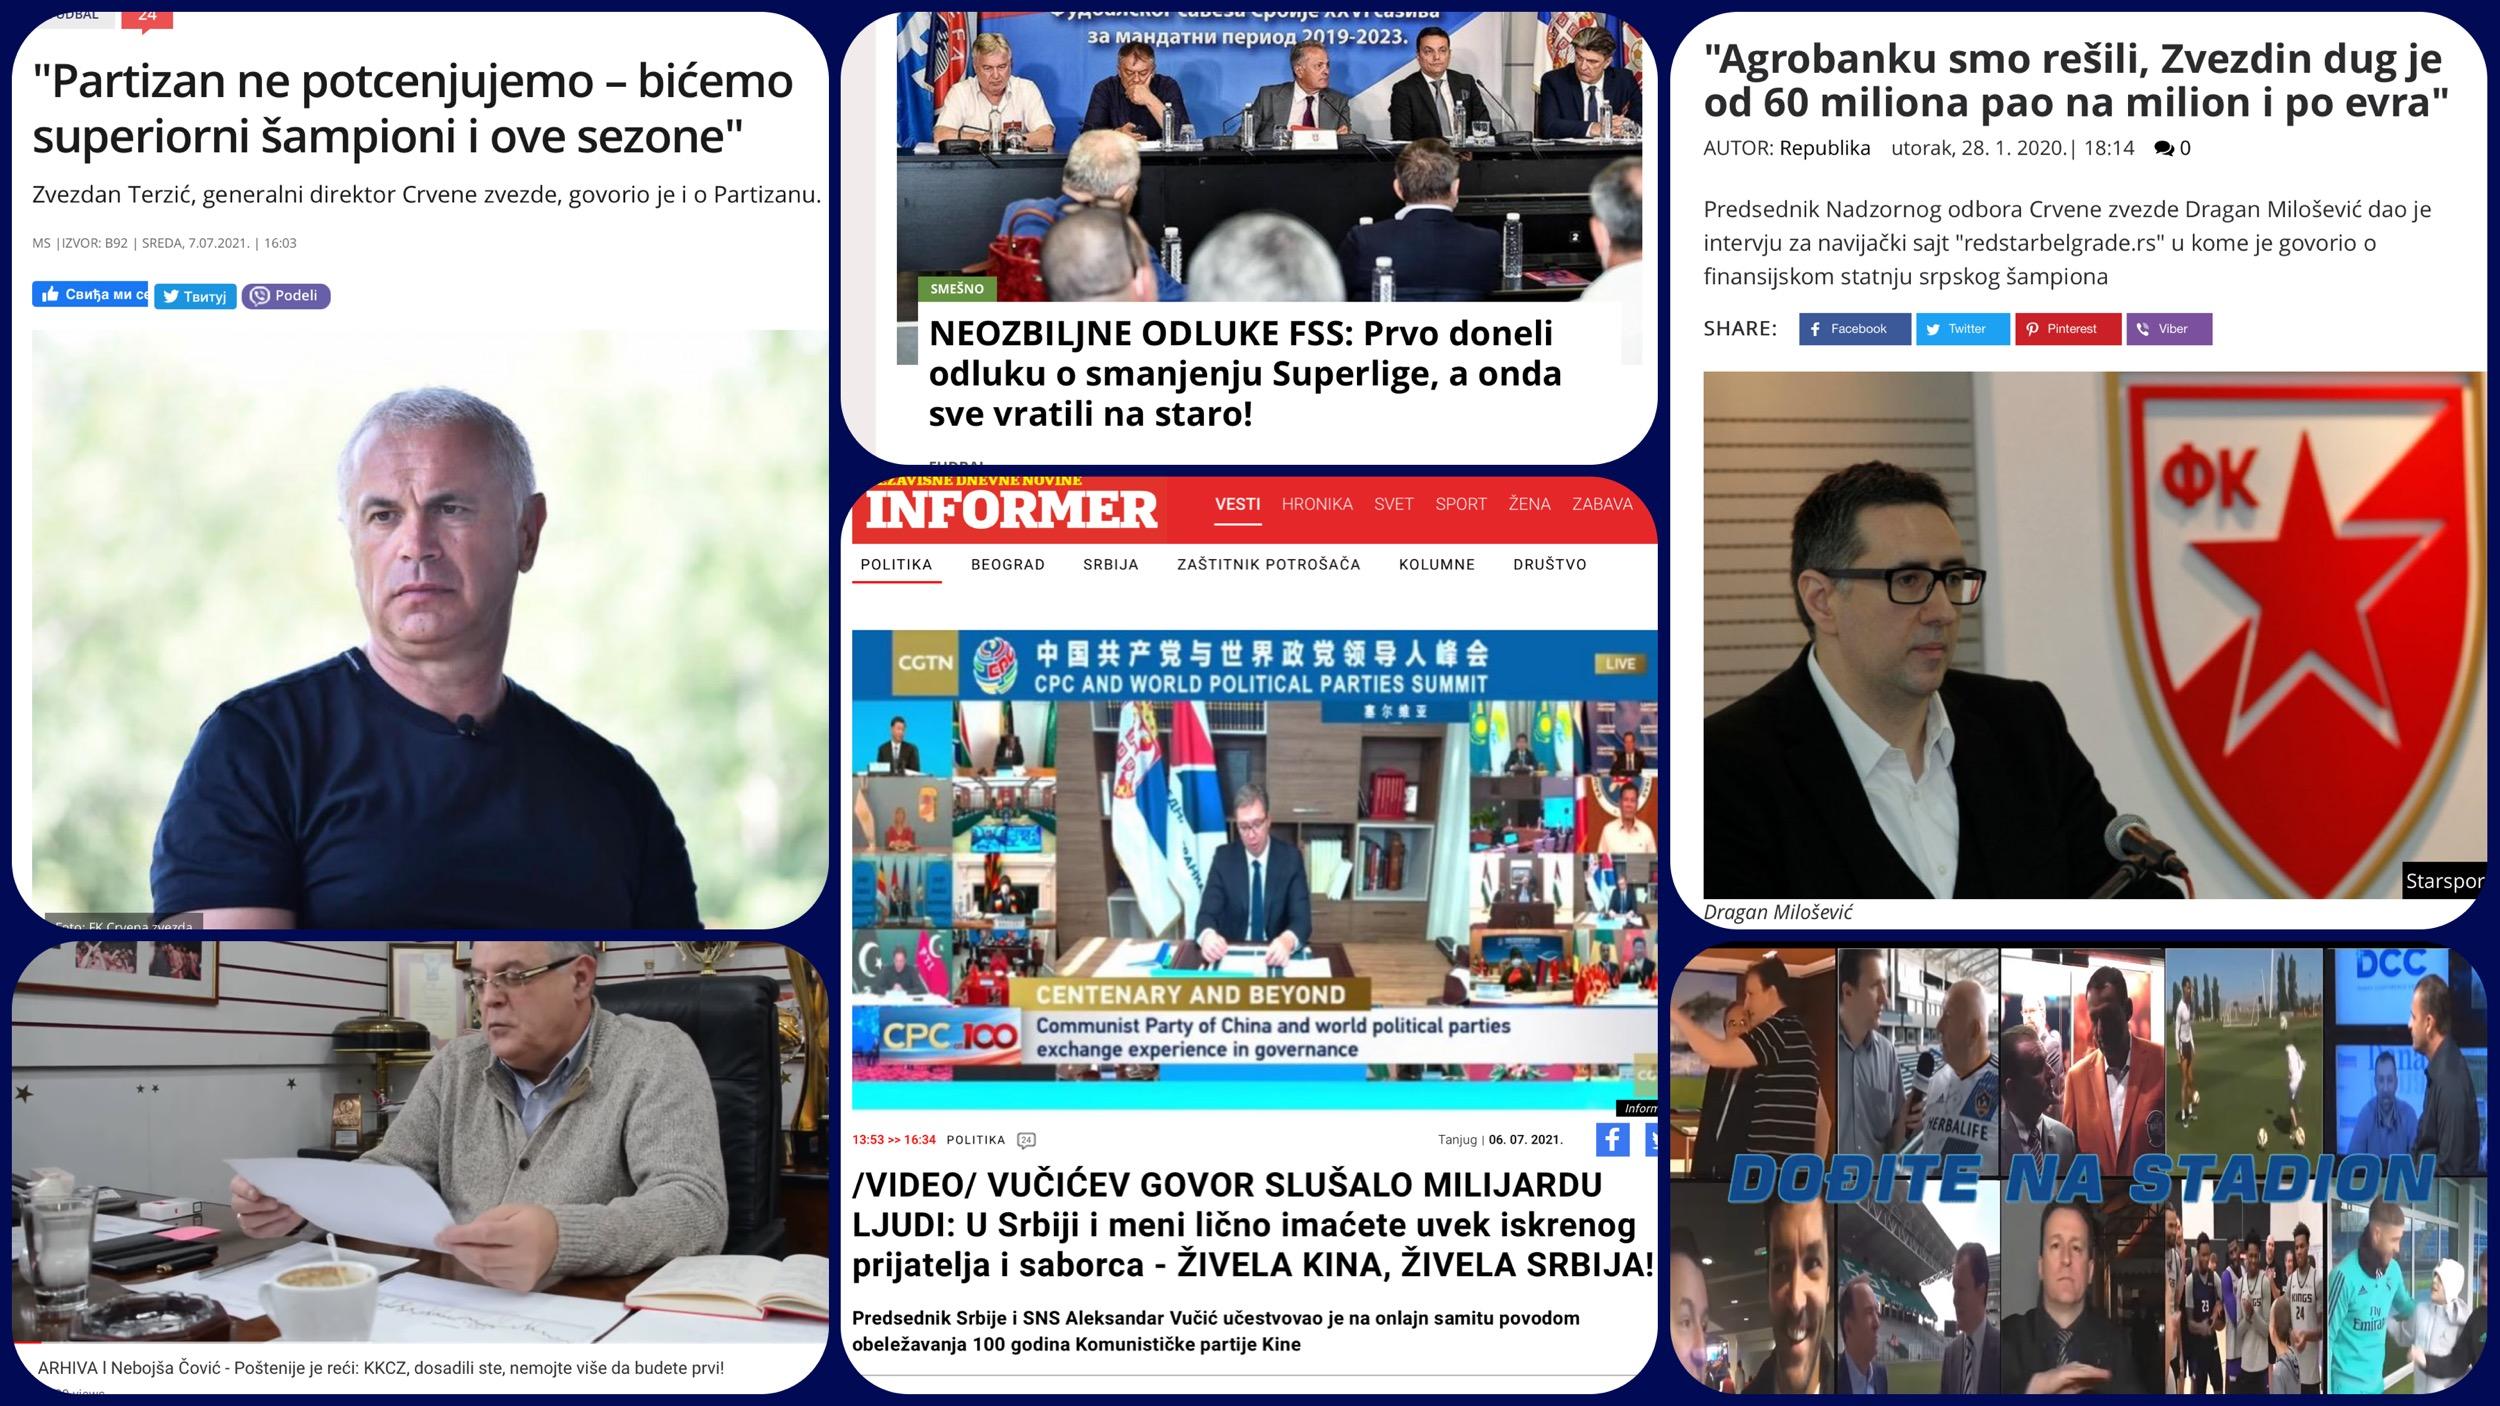 Željko Pantić: Dođite na stadion 437. Vučić, Komunistička partija i Crveno bela armija…(VIDEO)